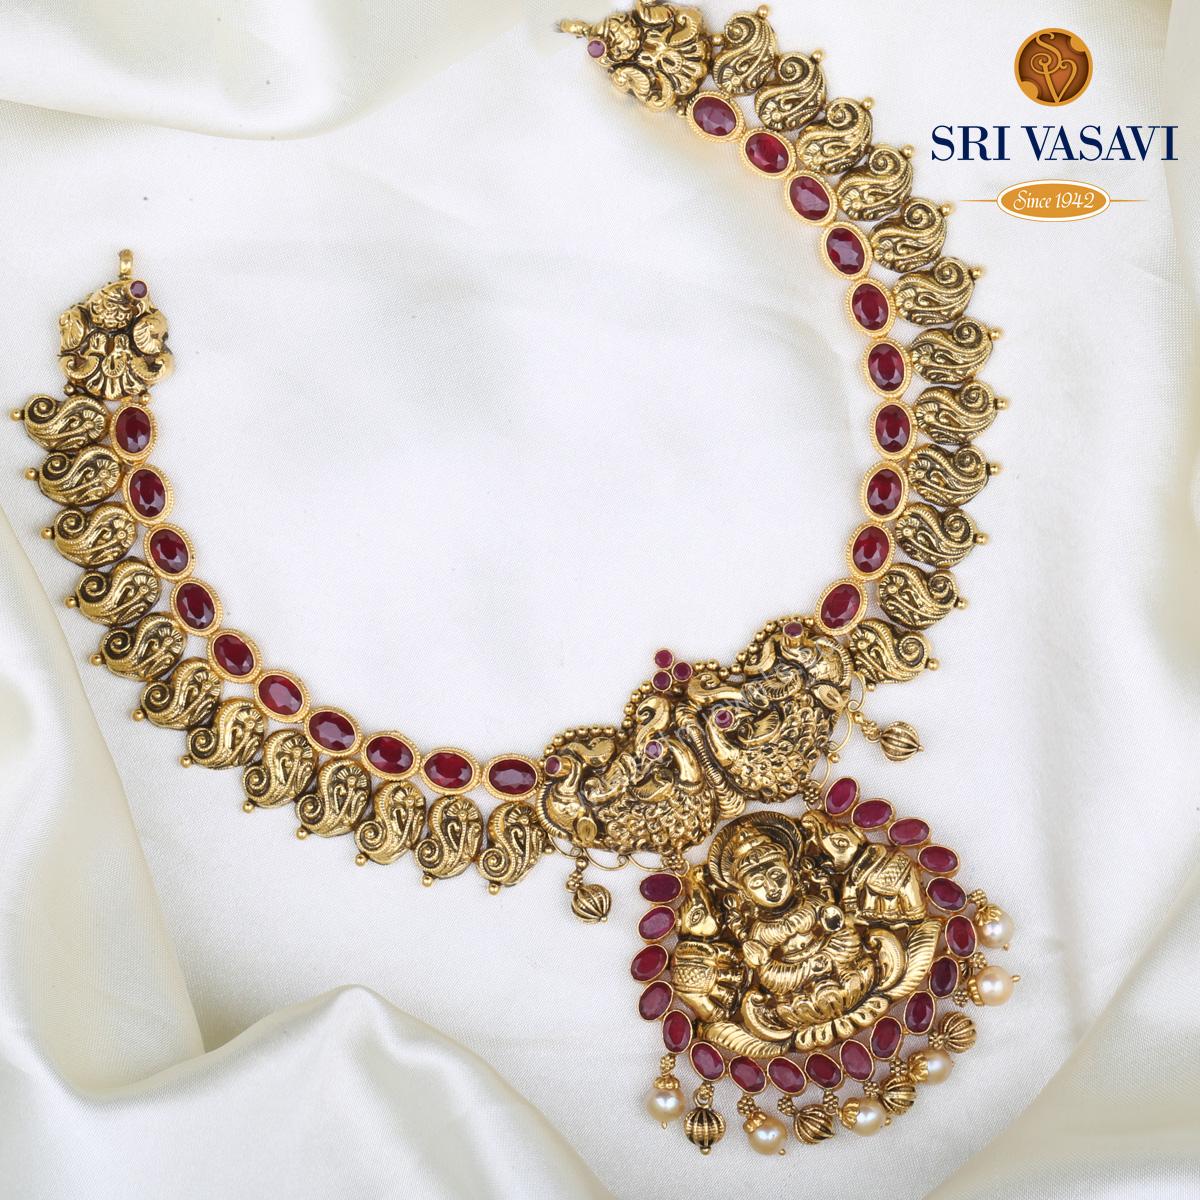 Bhagawati Short Necklace